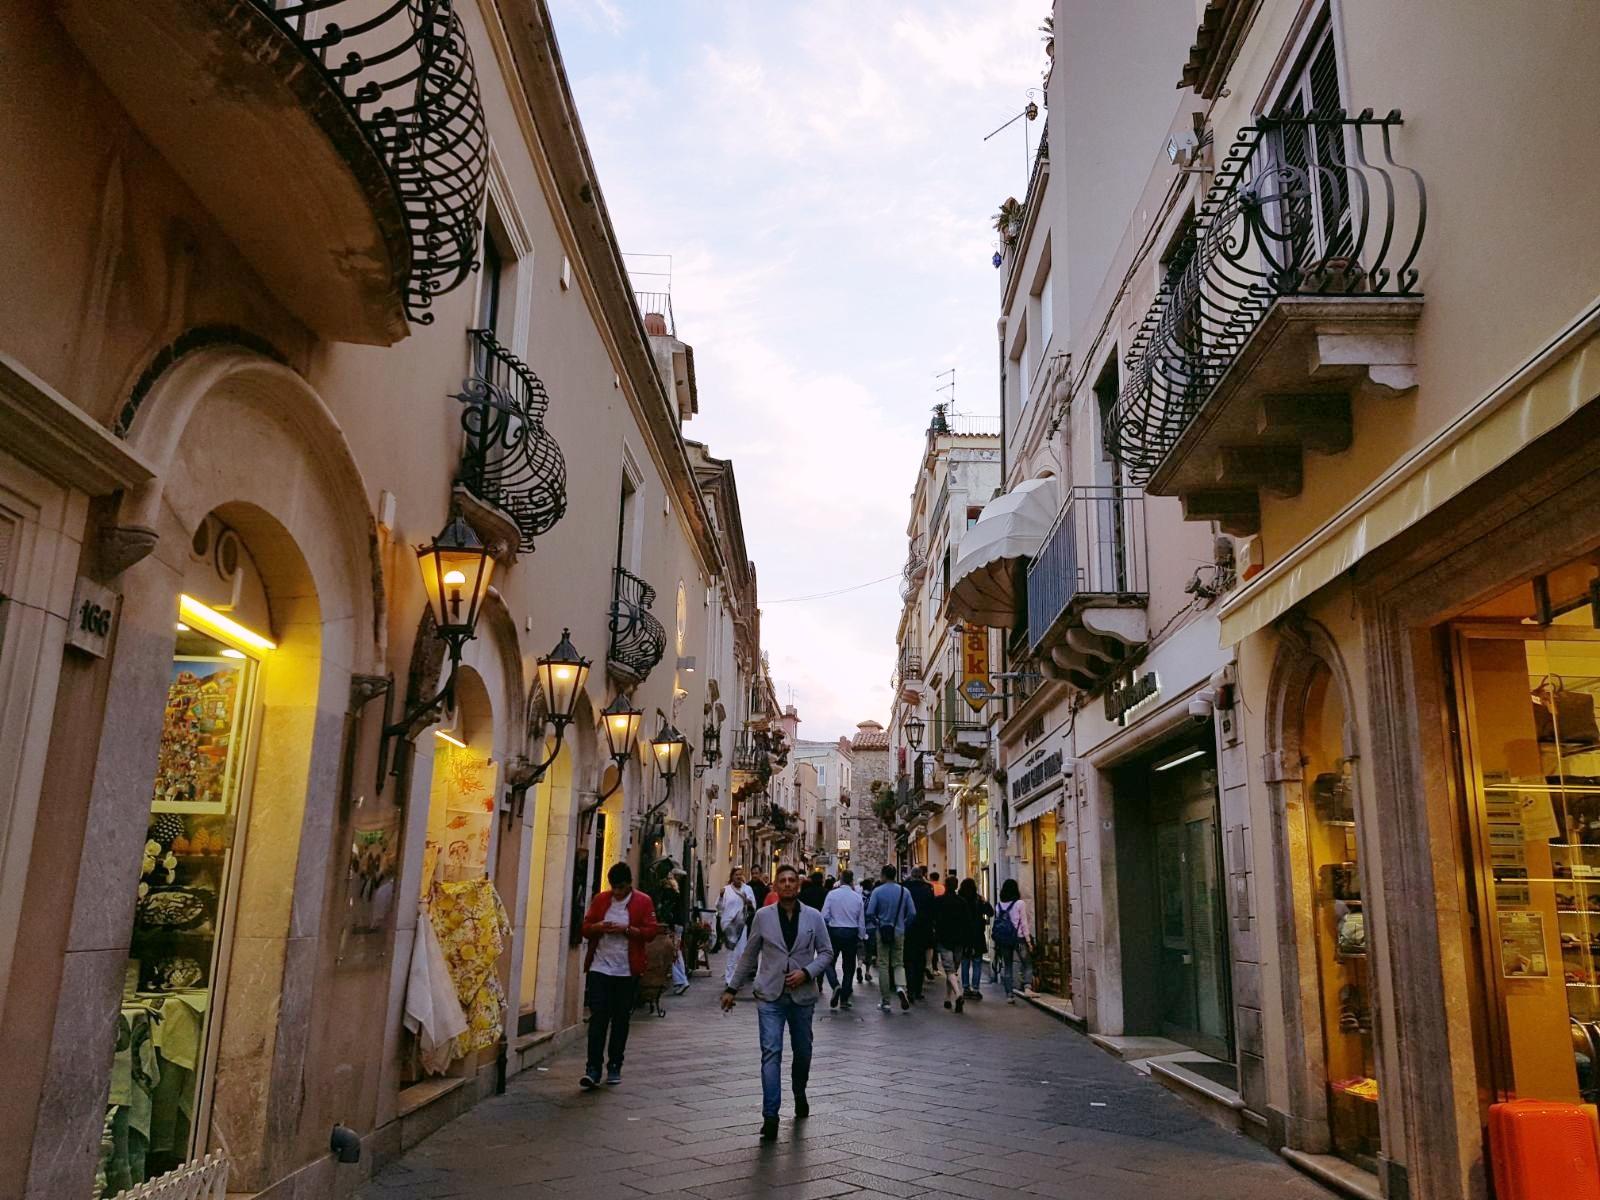 The popular Corso Umberto